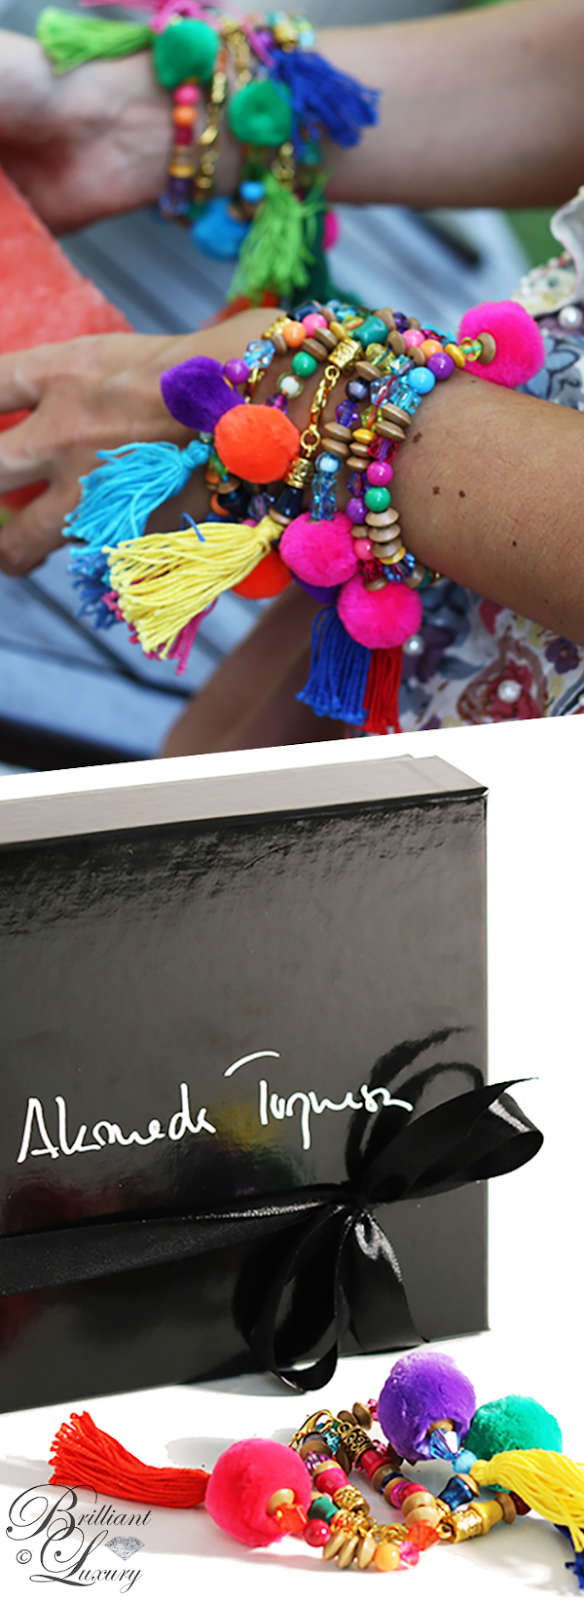 Brilliant Luxury ♦ Alameda Turquesa The Pom Pom To My Tassel multi-colored bracelet